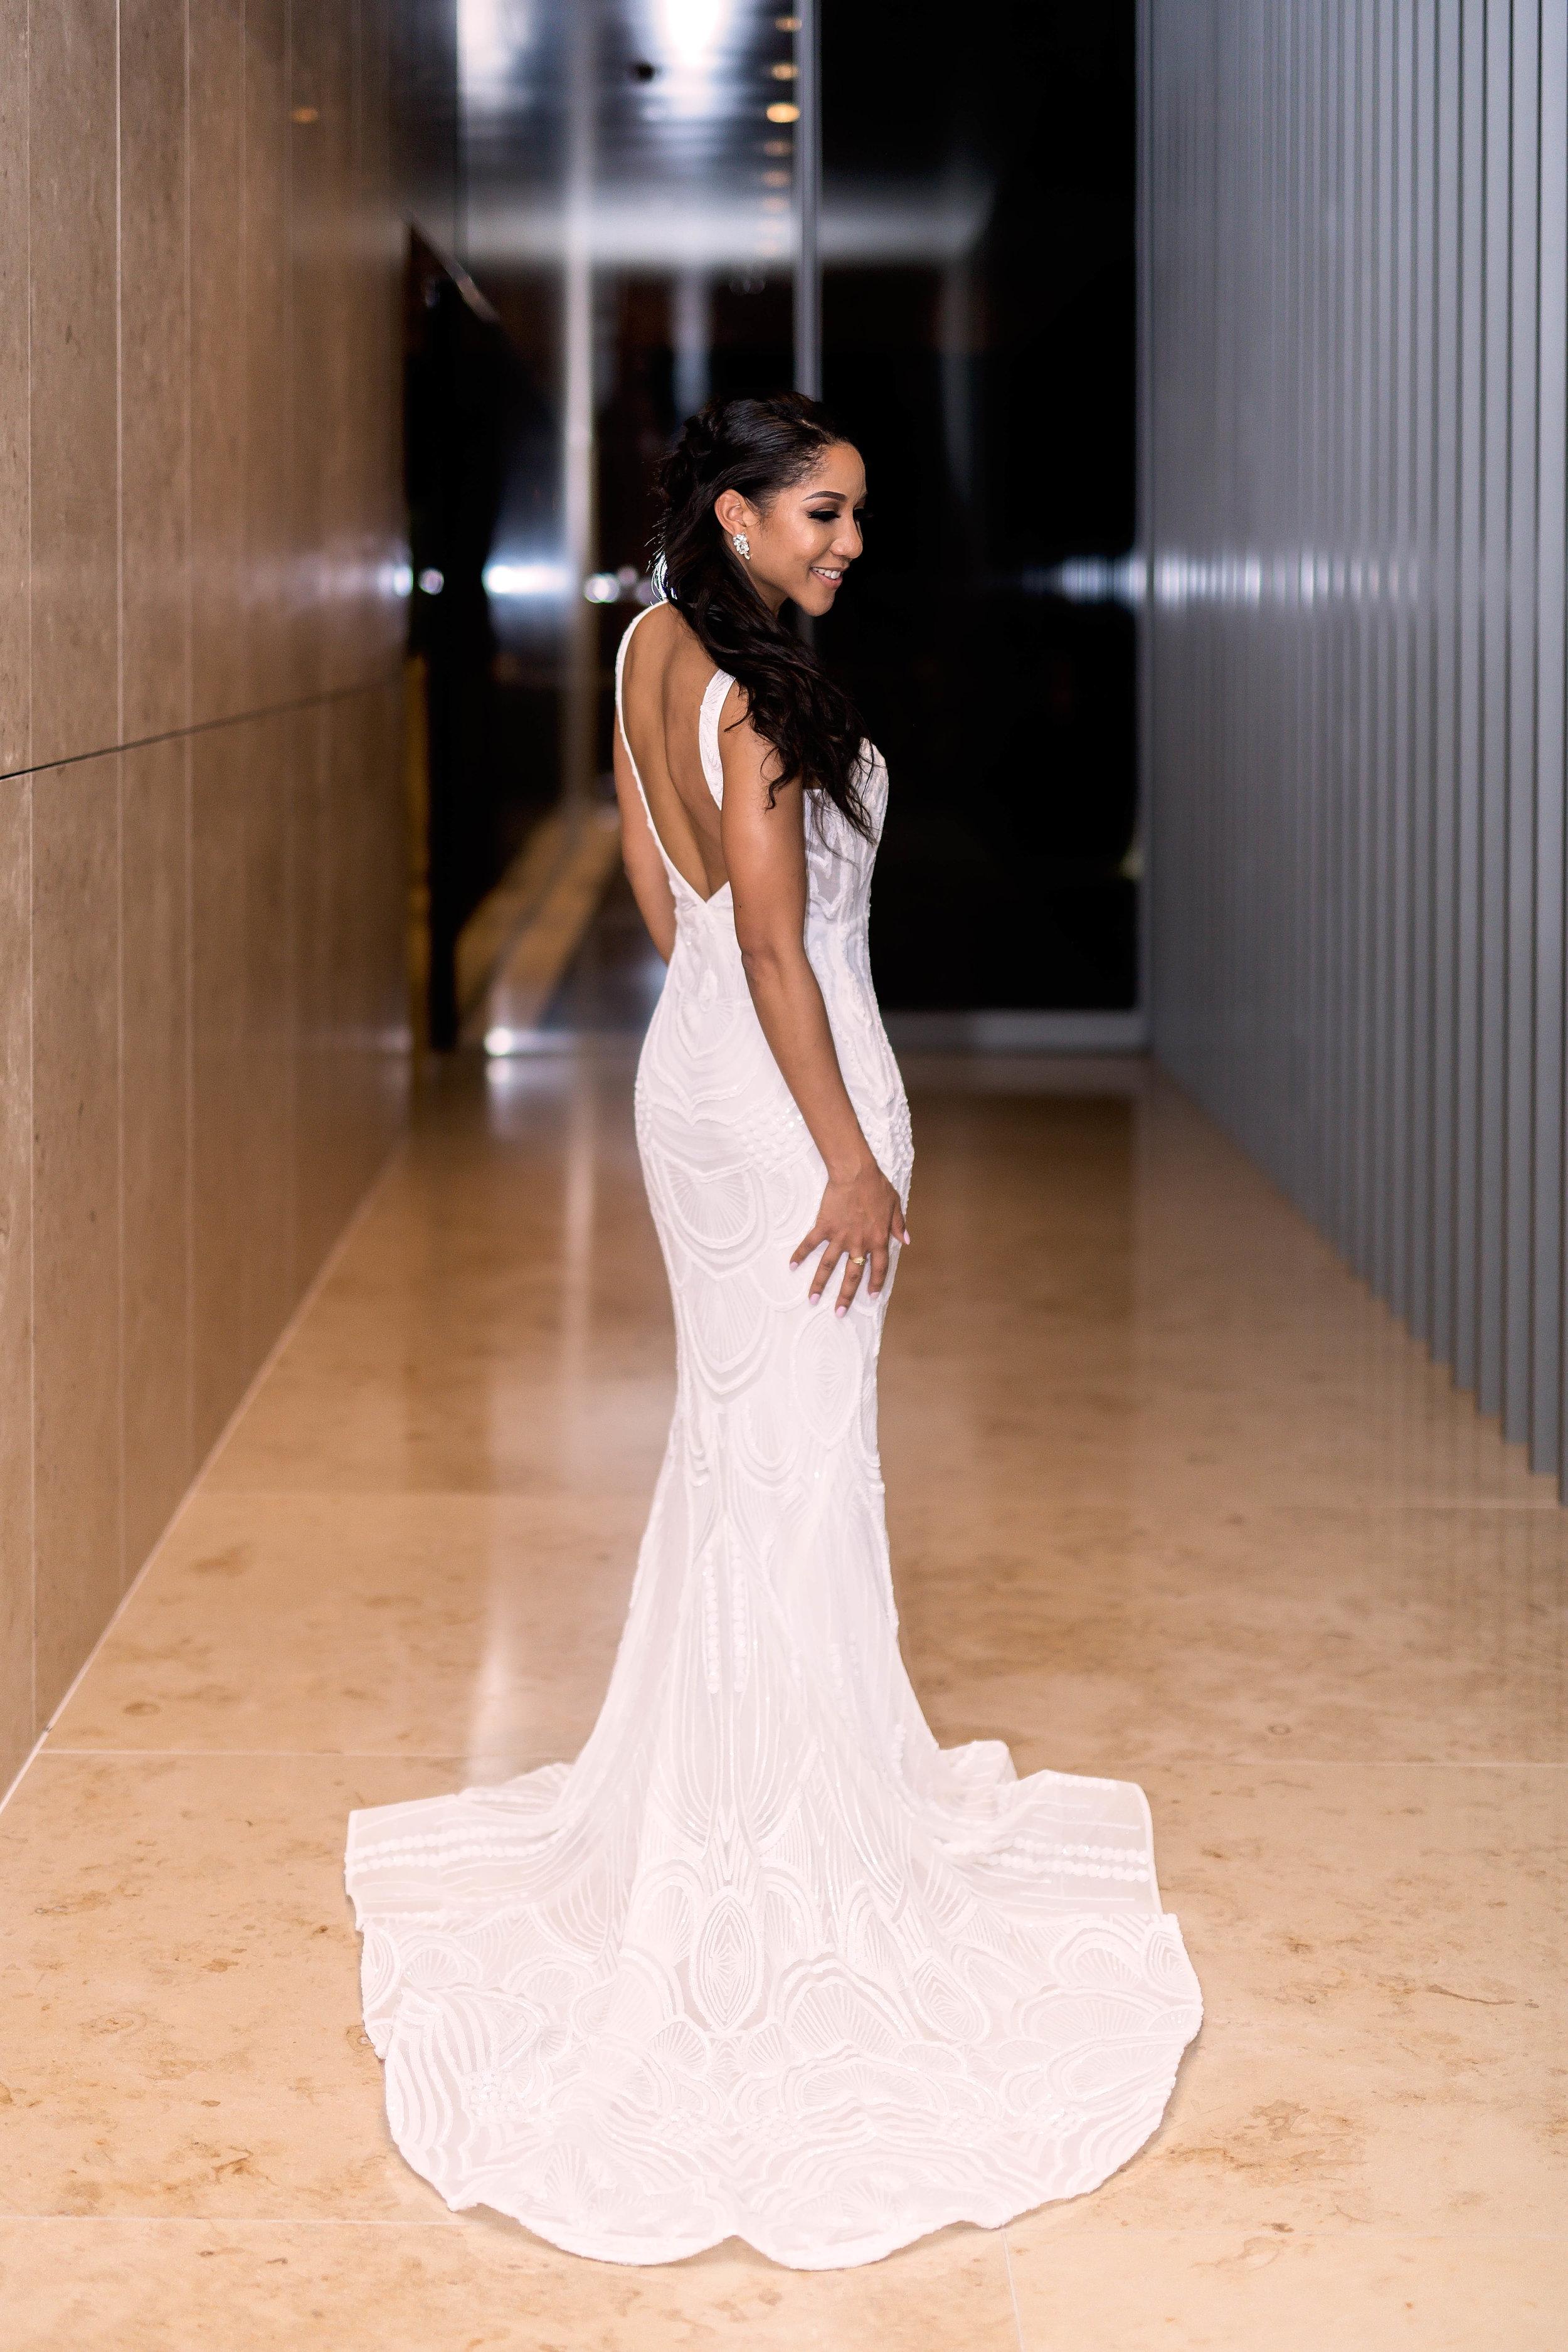 Houston Wedding- Pharris Photography- Reception- Natalie + Mark- Bride